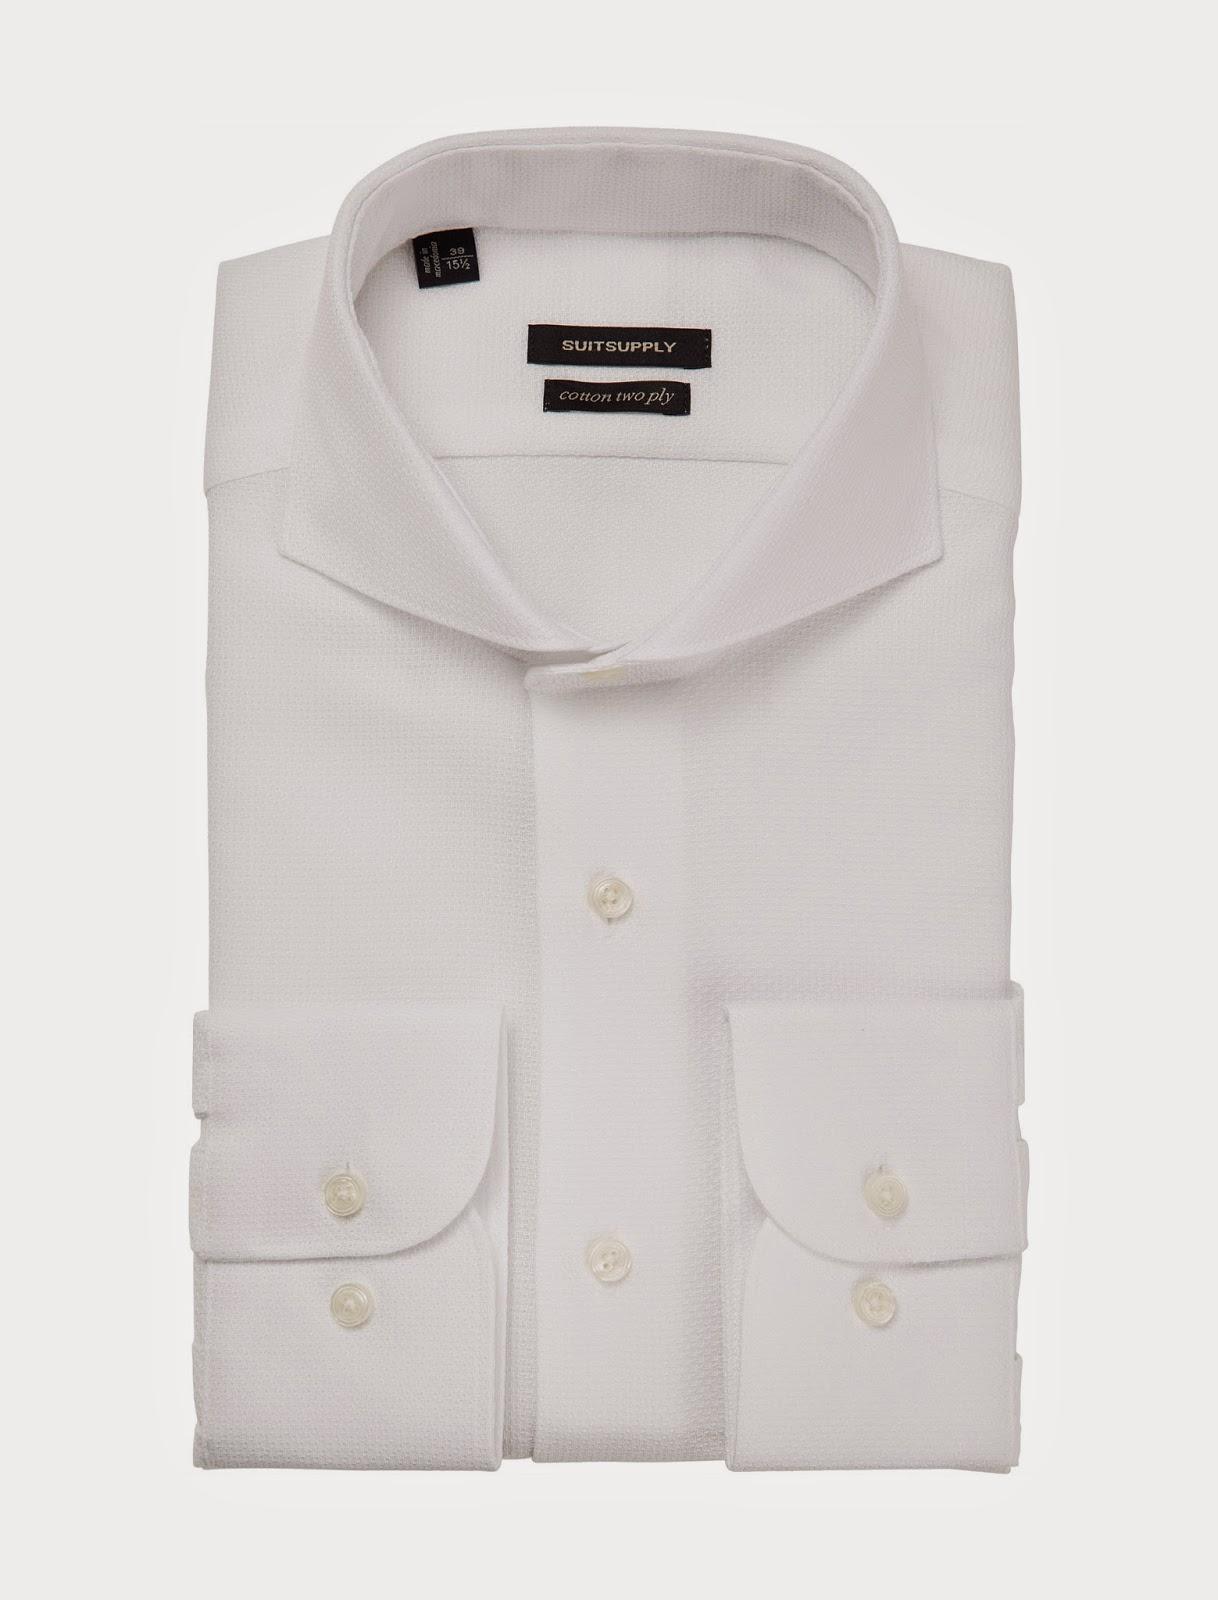 http://eu.suitsupply.com/es_ES/shirts/camisa-blanco/H4520.html?start=1&cgid=Shirts